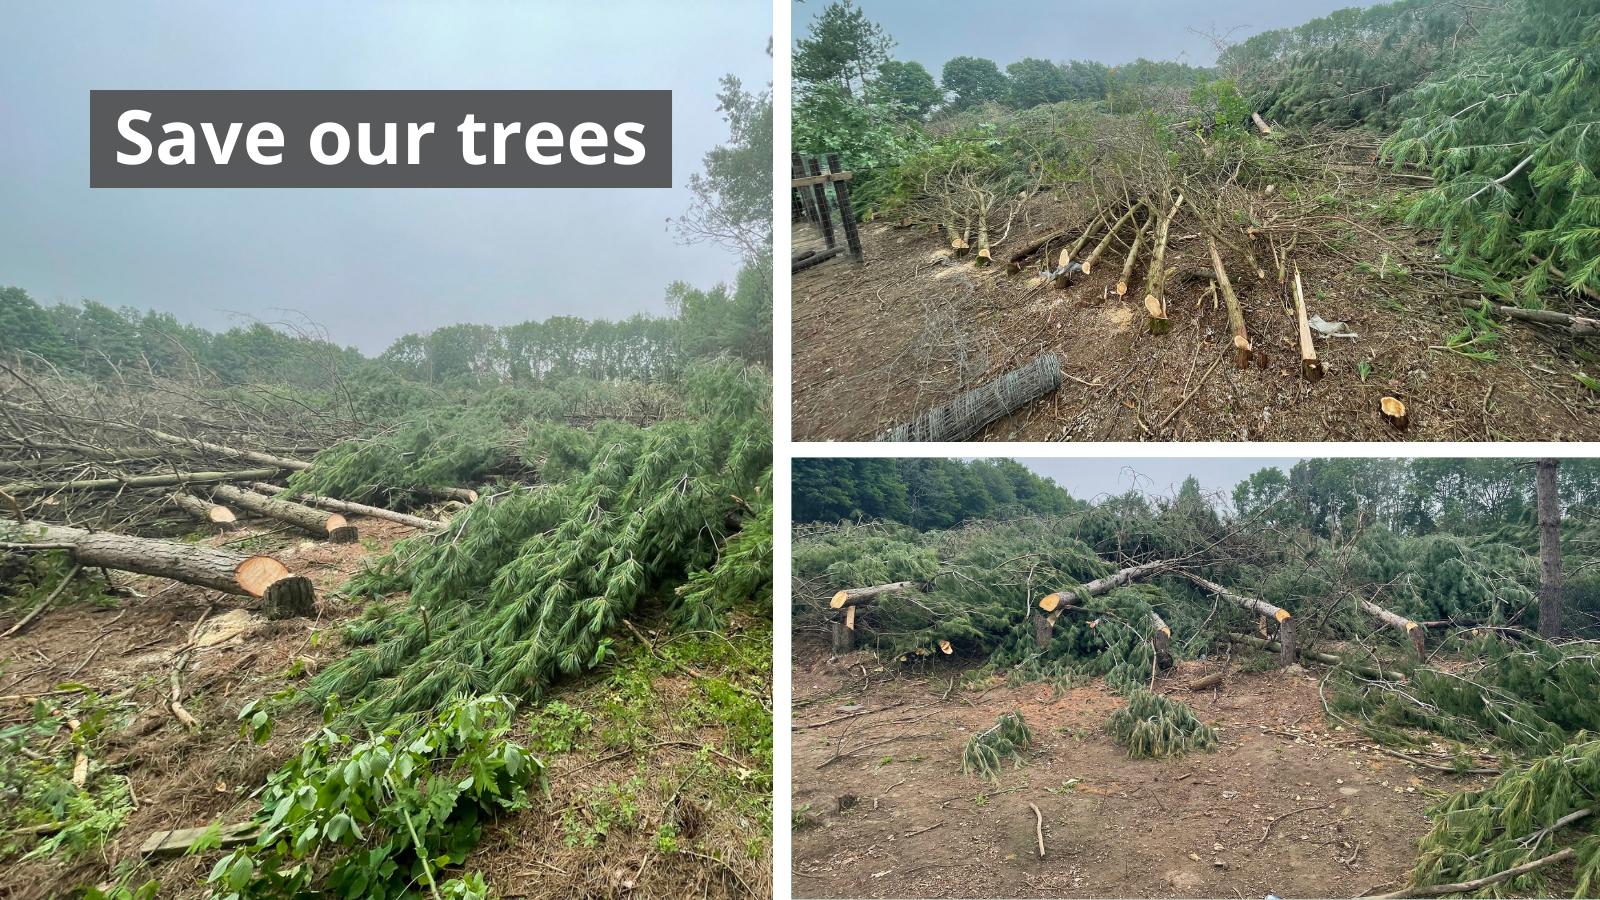 Cutdown trees